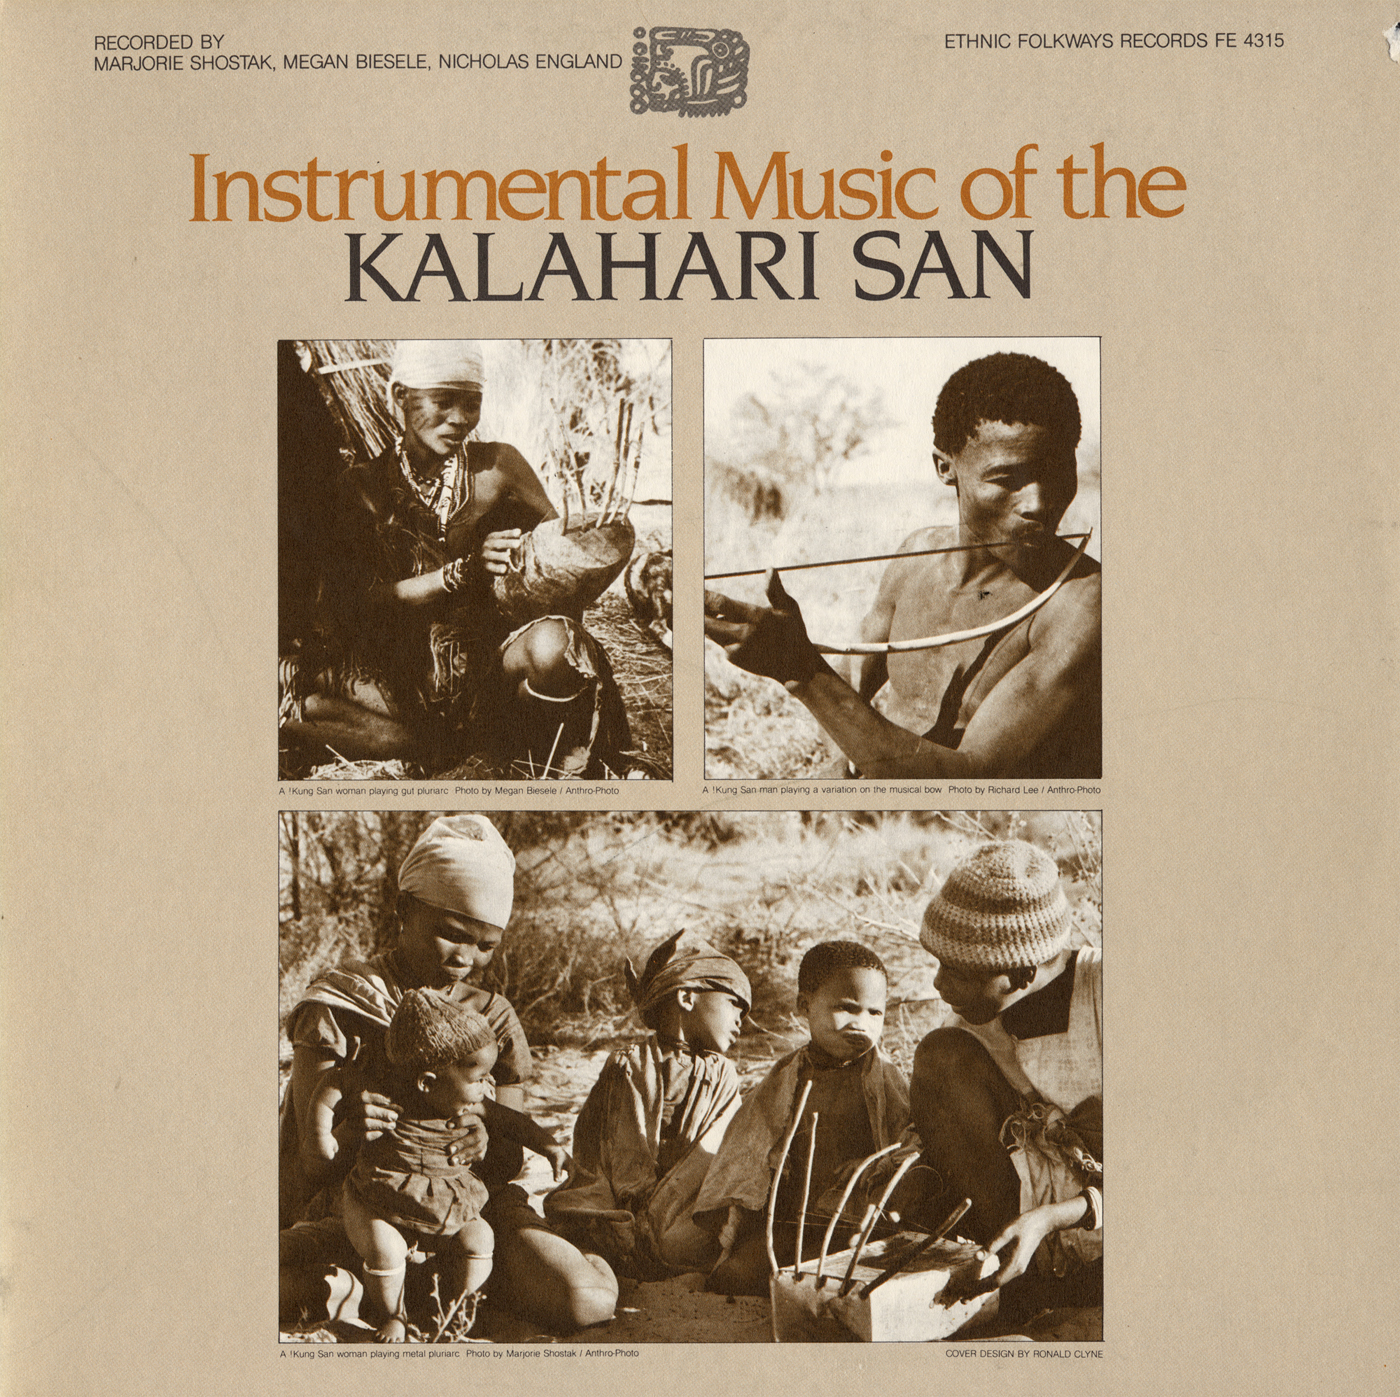 Instrumental Music of the Kalahari San | Smithsonian